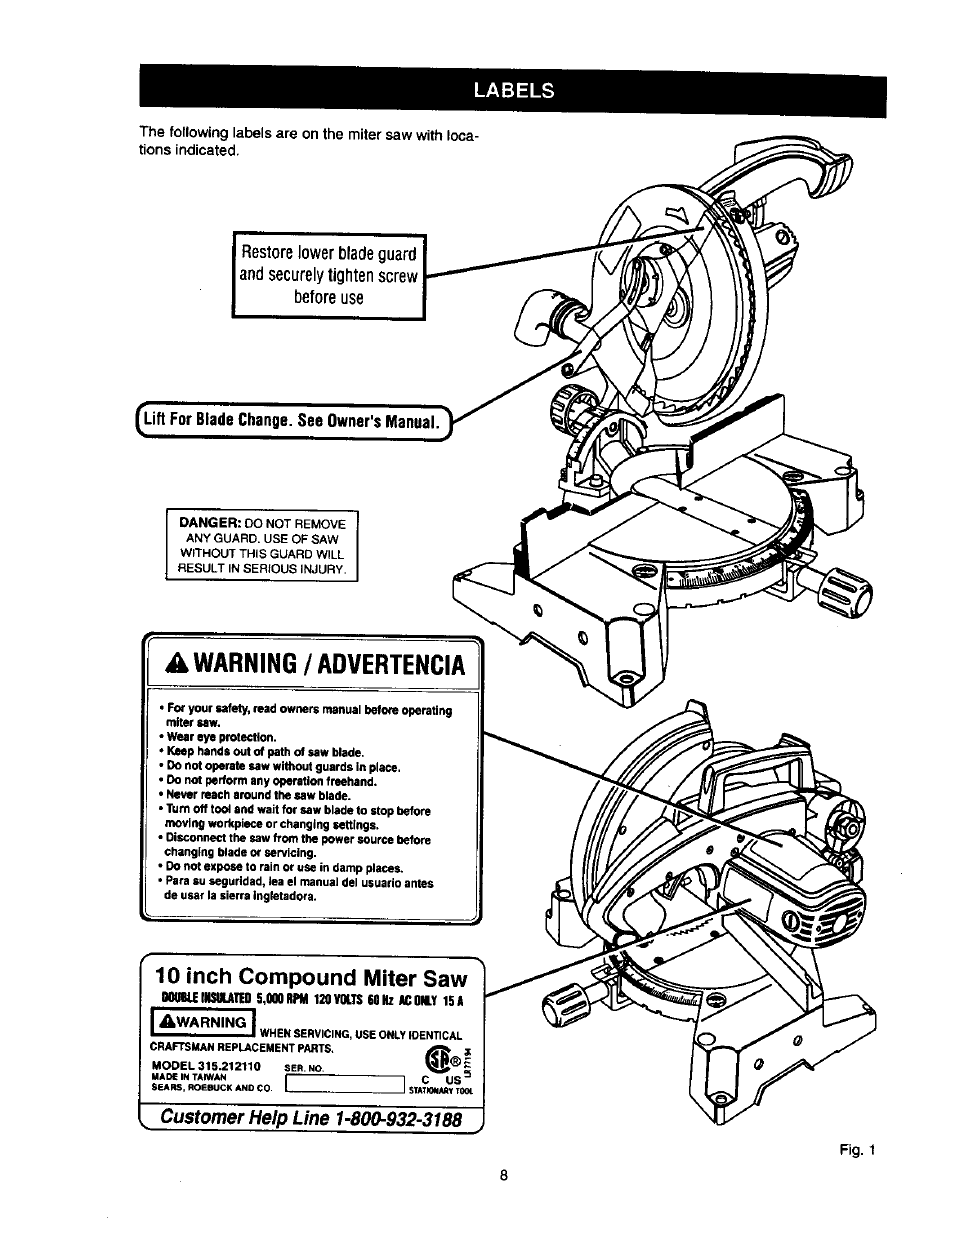 10 inch compound miter saw craftsman 315 212110 user manual page rh manualsdir com Craftsman 10 Inch Miter Saw Craftsman 10 Inch Compound Miter Saw Parts